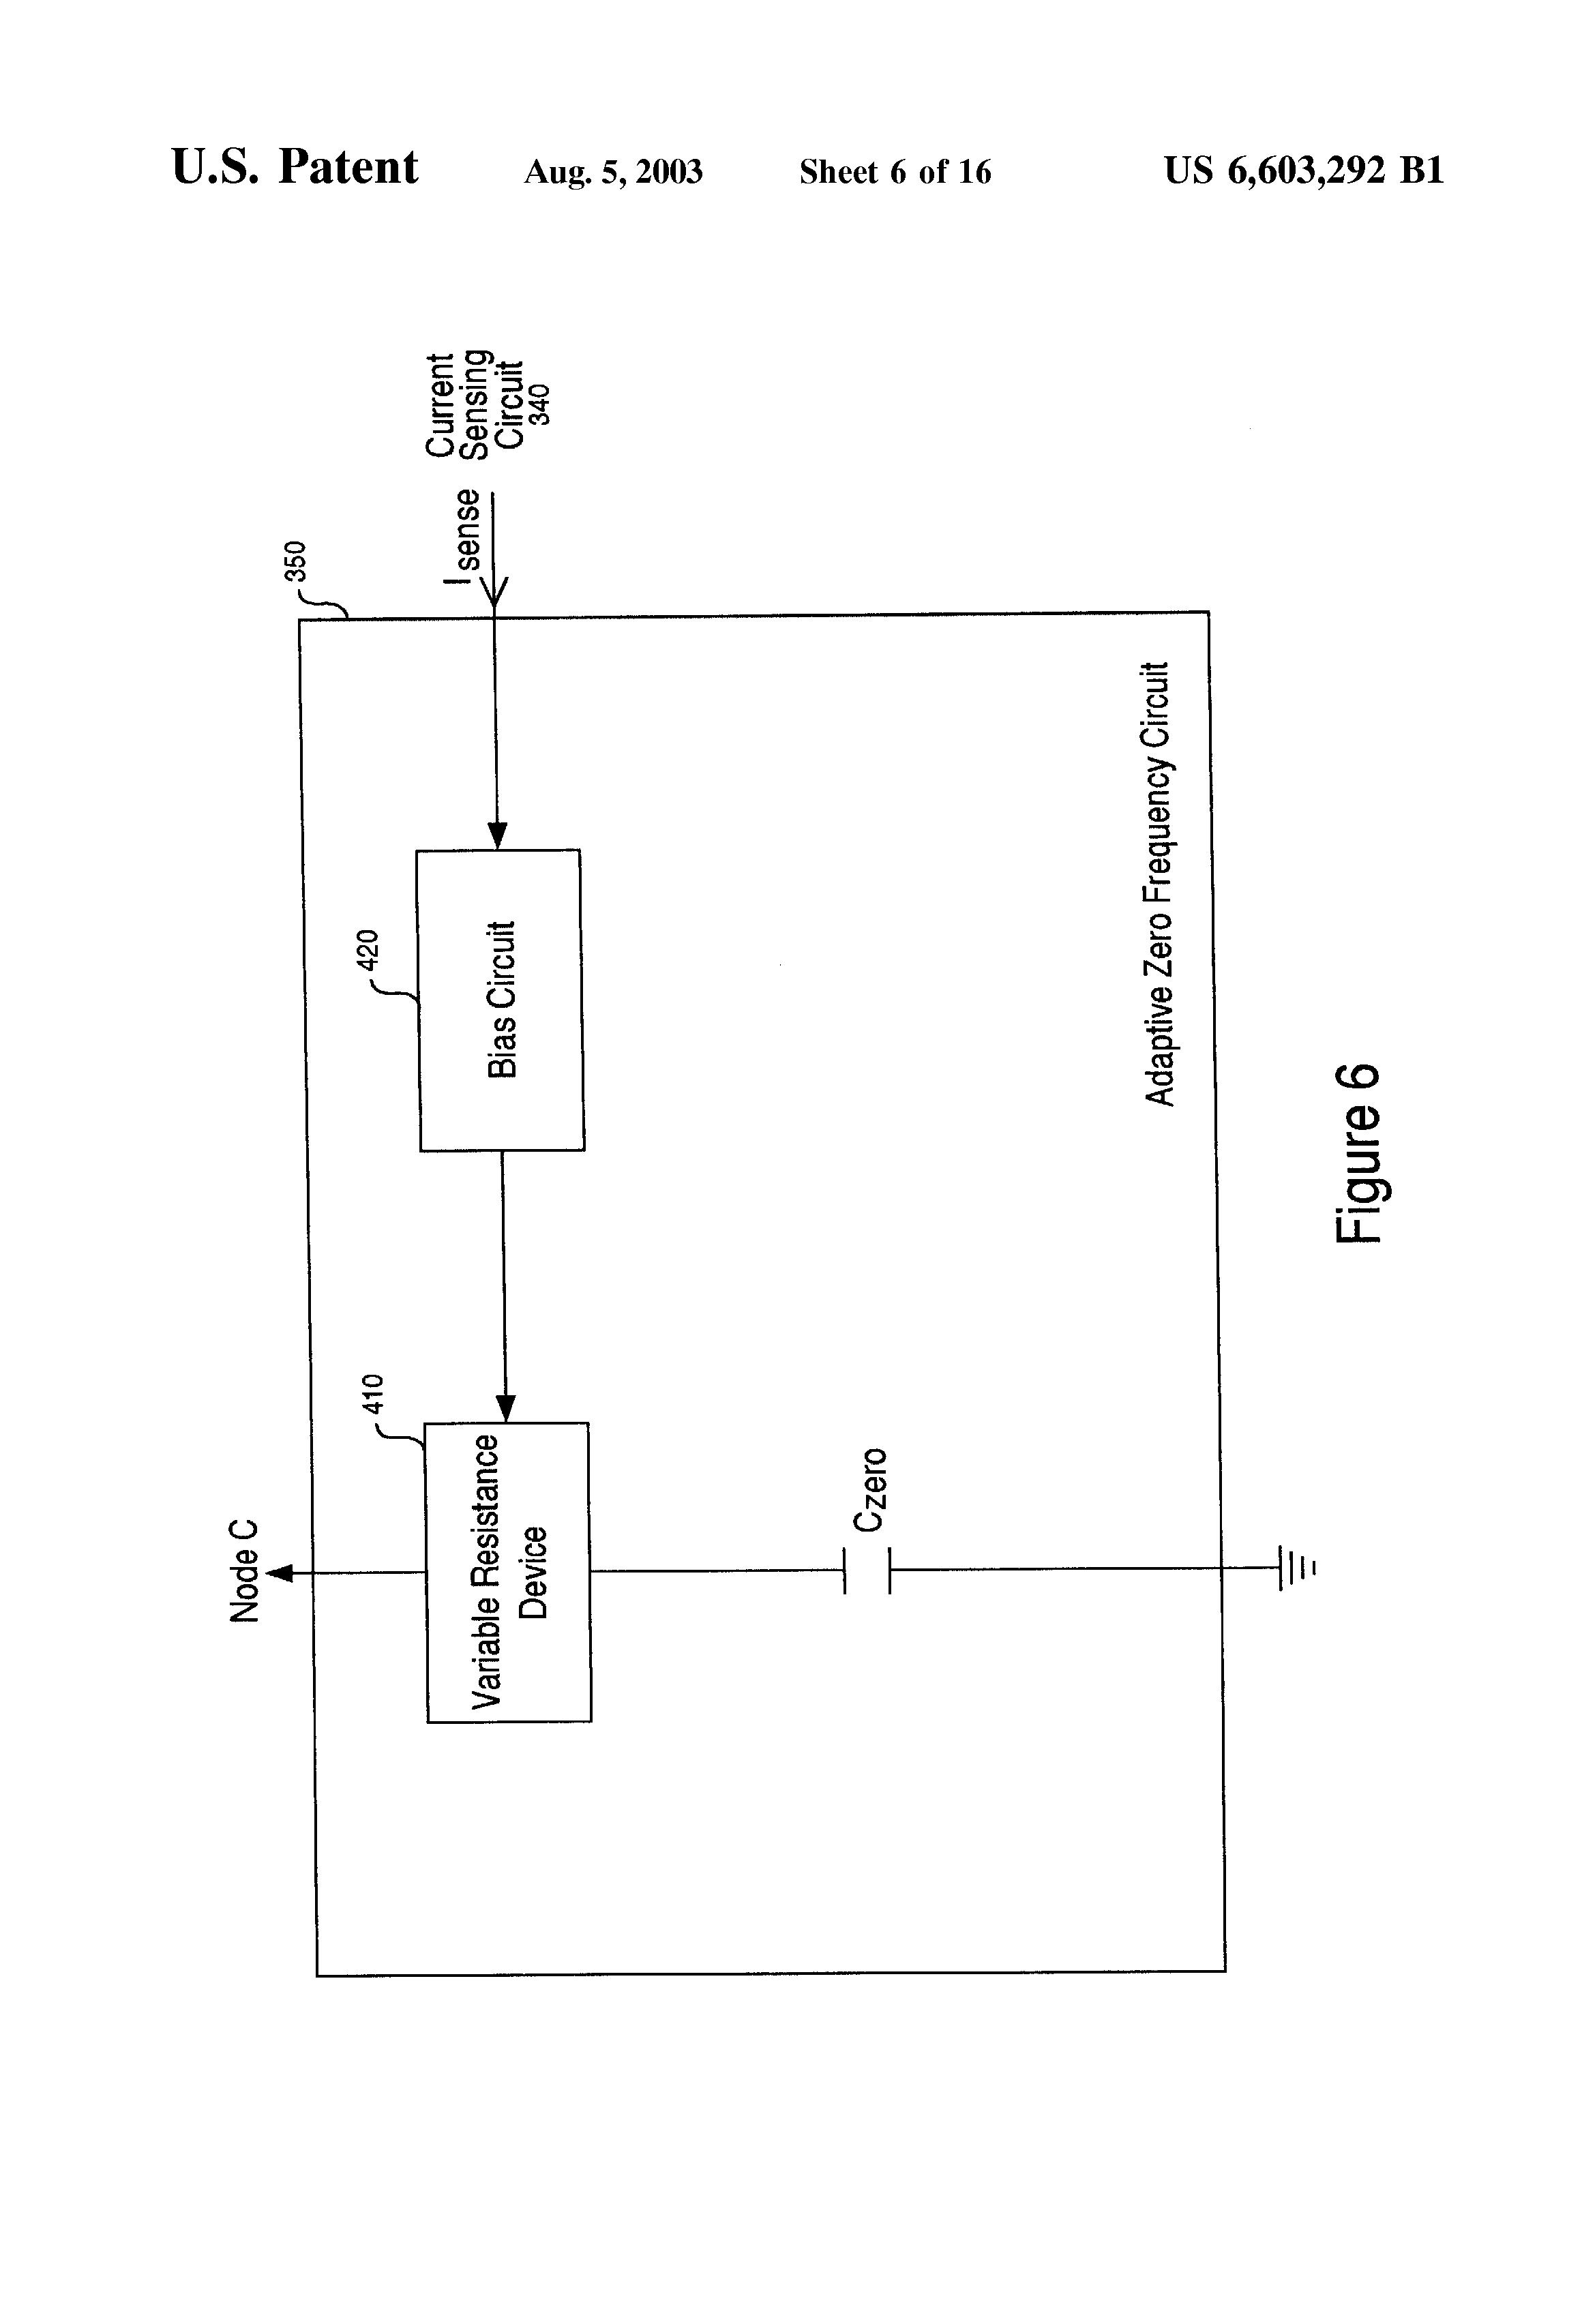 Us 6603292 B1 Ldo Regulator Having An Adaptive Zero Frequency Current Detector Circuit Page 7 30